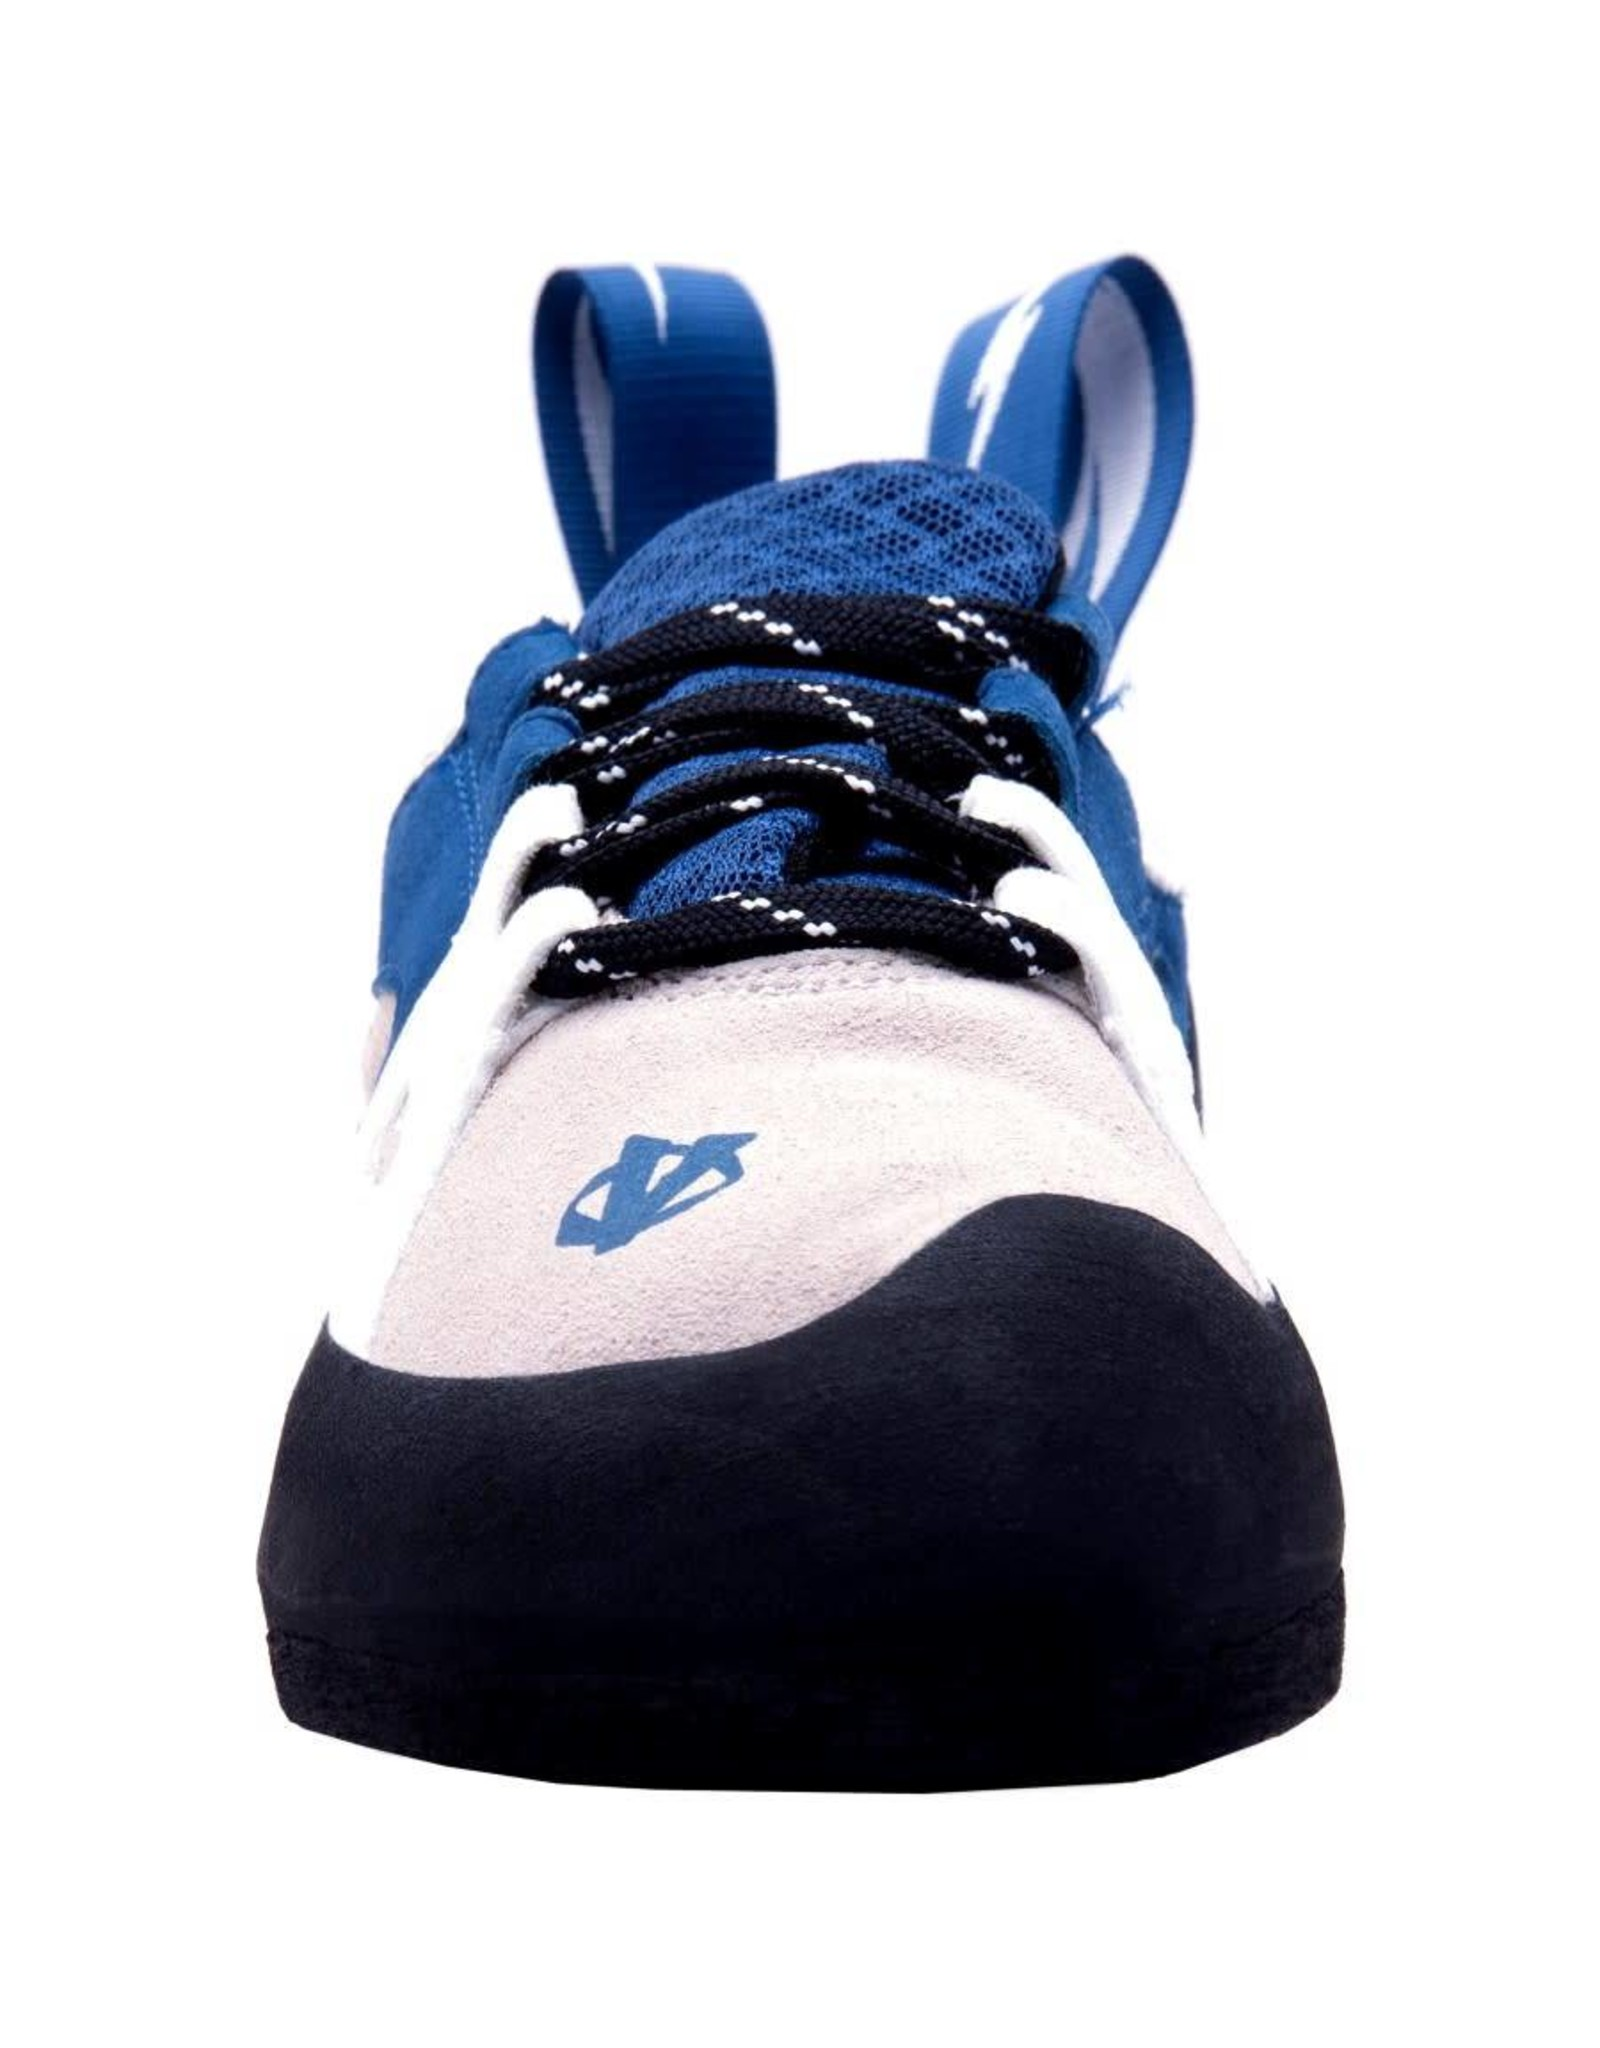 Evolv Evolv Skyhawk Climbing Shoes - Women's